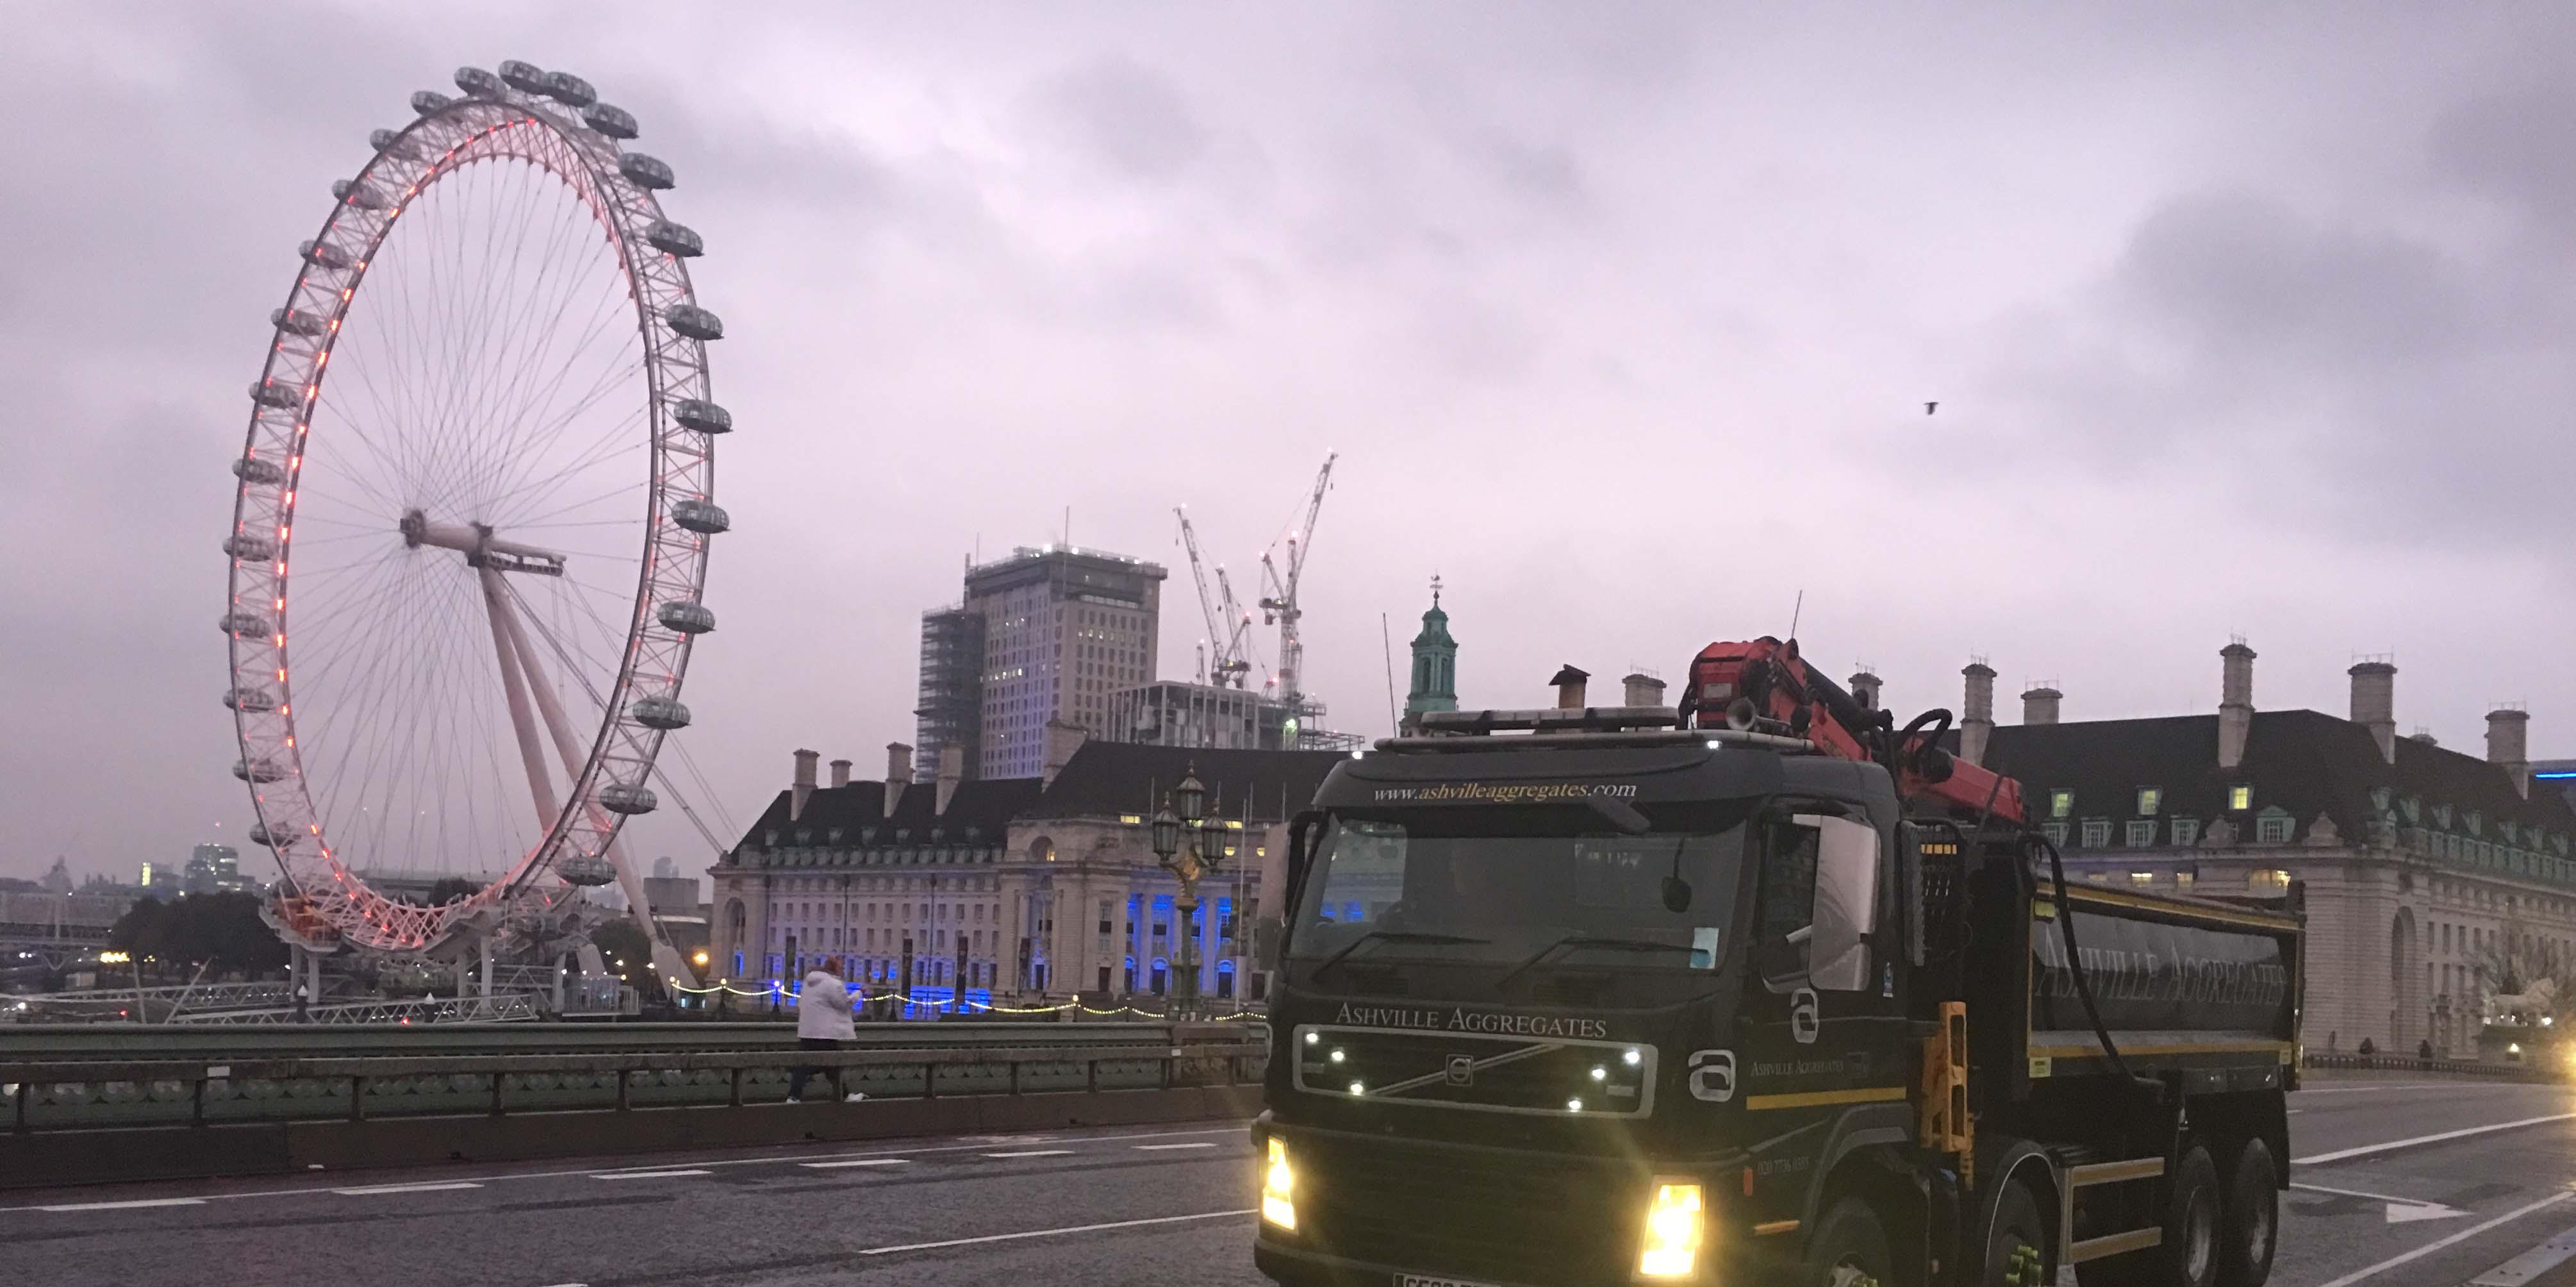 Grab Hire London | Ashville Aggregates